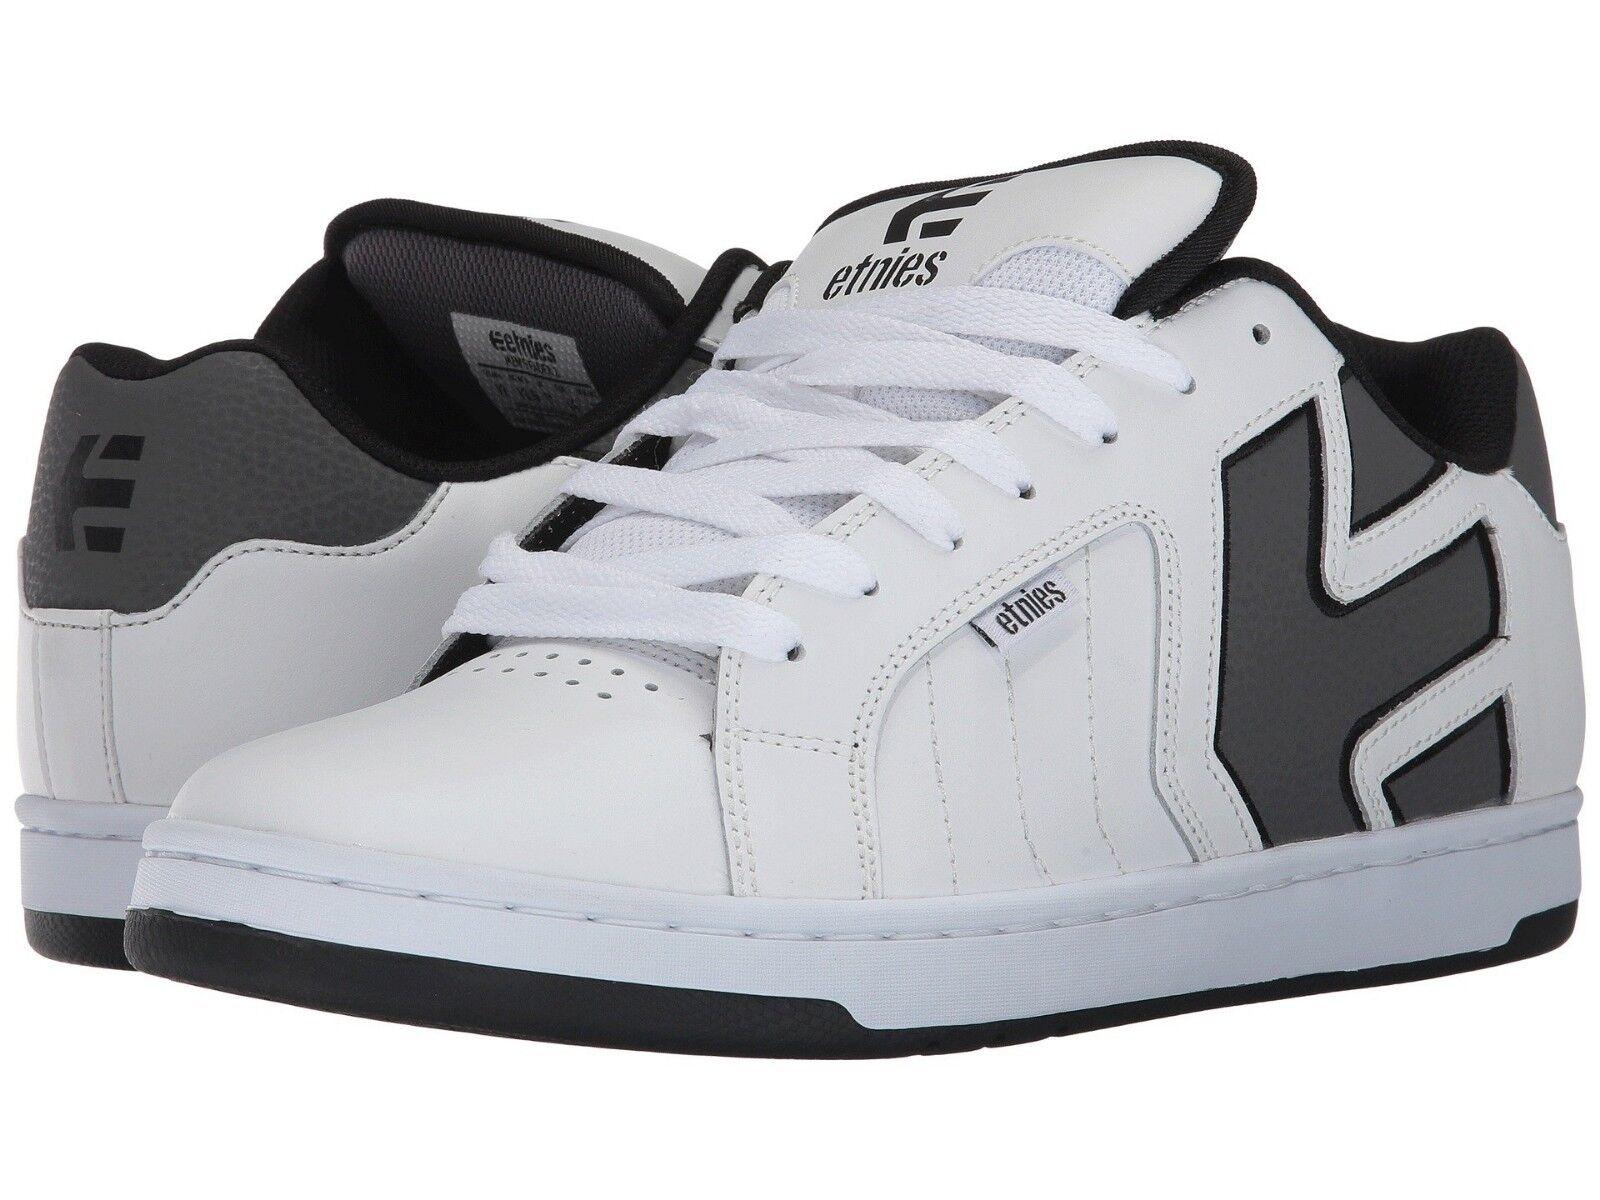 mens etnies fader 2 skateboarden - schuhe nib weiße grau - skateboarden schwarz 848a17